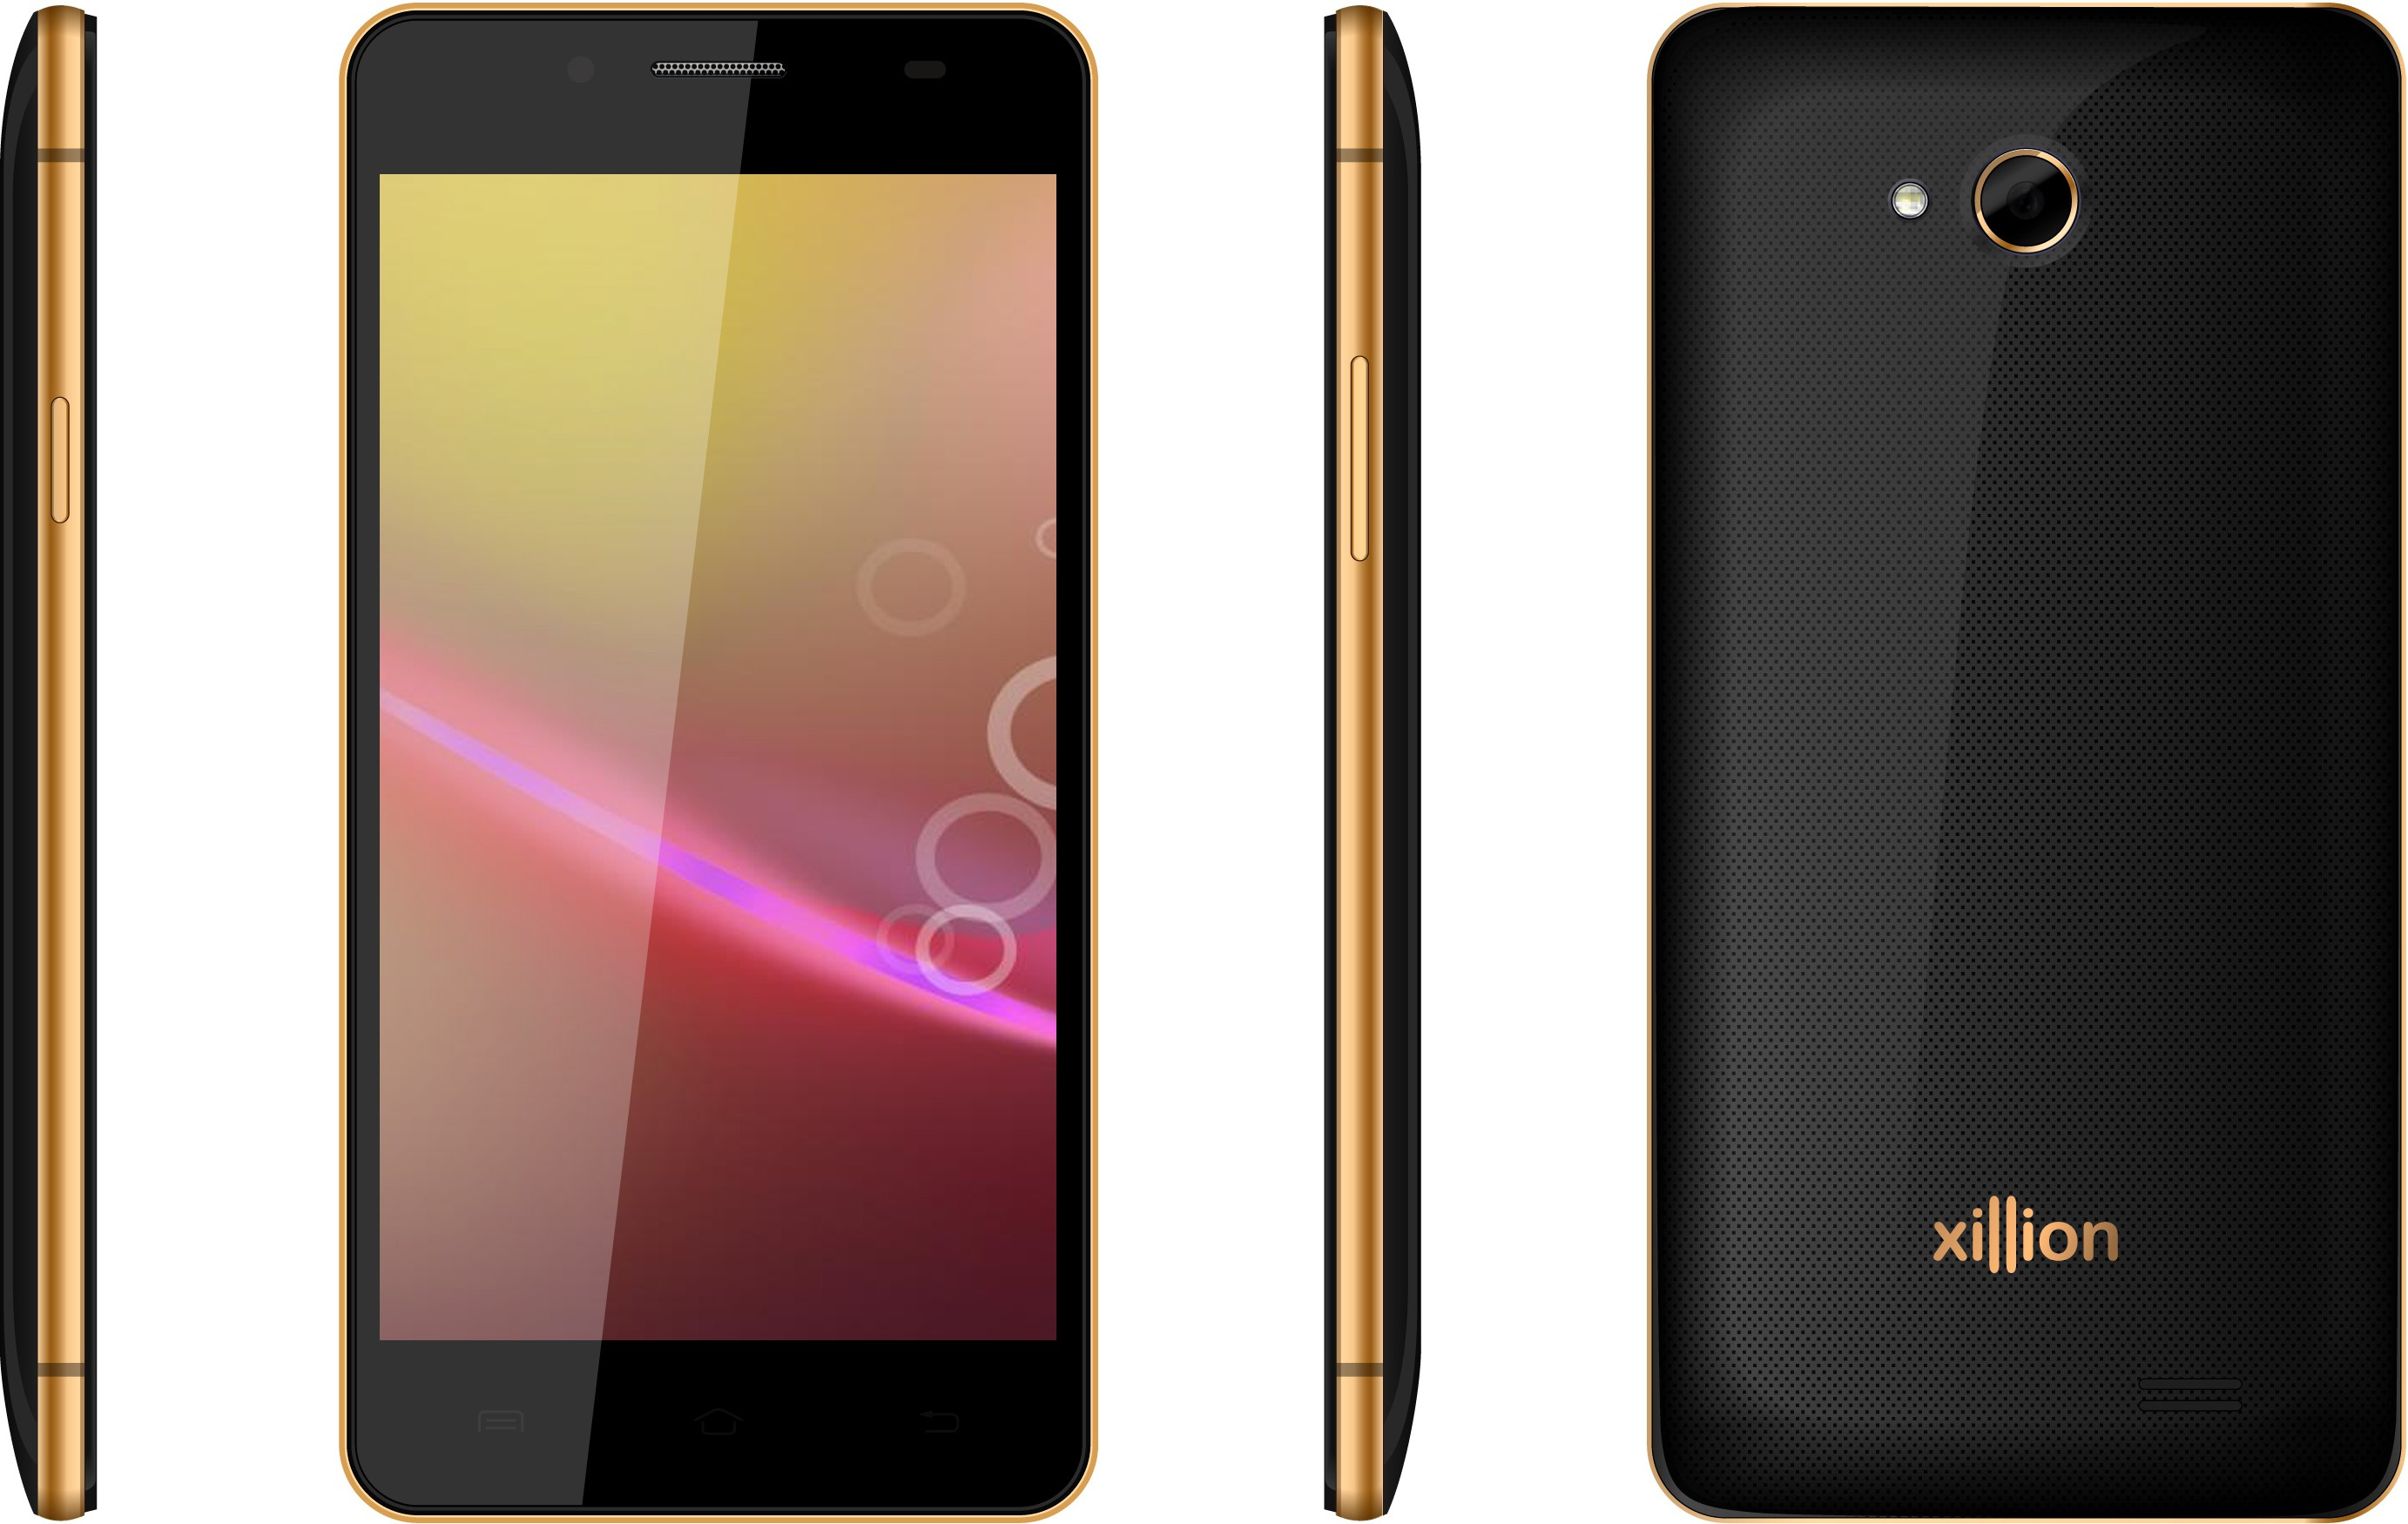 Xillion X403 (1GB RAM, 8GB)